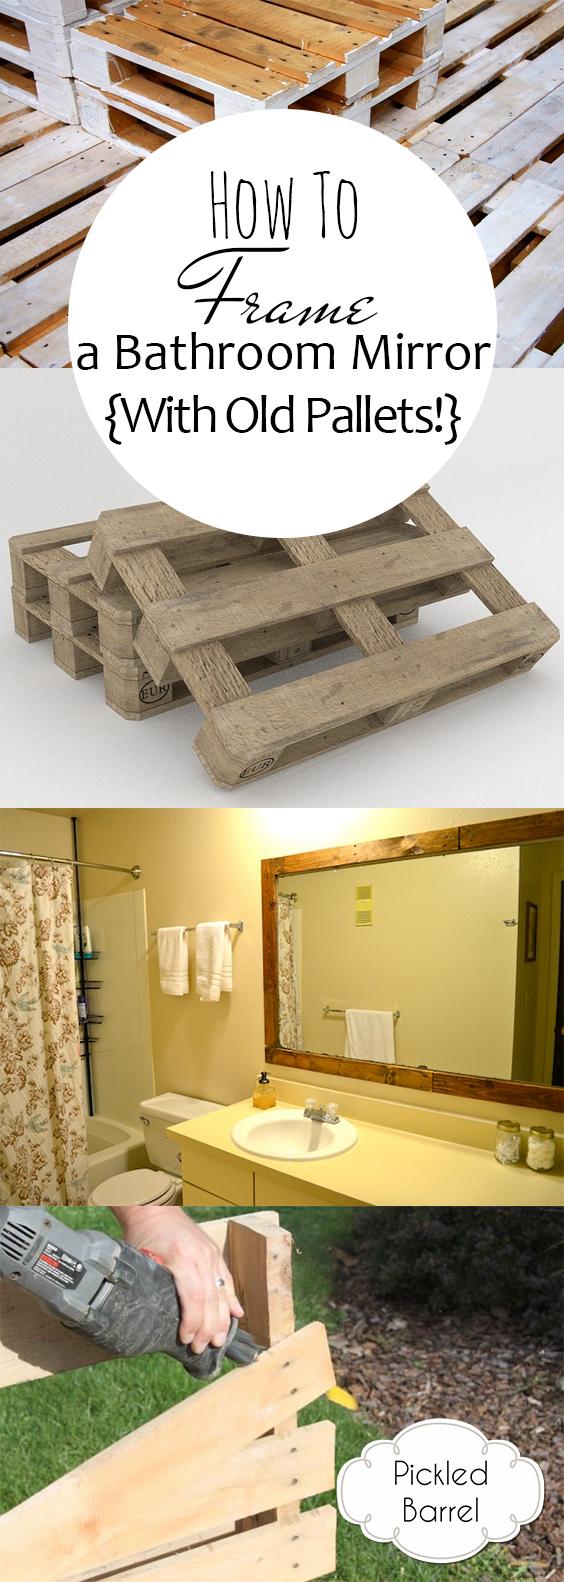 Bathroom Mirror, How to Frame A Bathroom Mirror, Bathroom Remodel, How to Remodel Your Bathroom, Quick Bathroom Remodel, DIY Bathroom Remodel